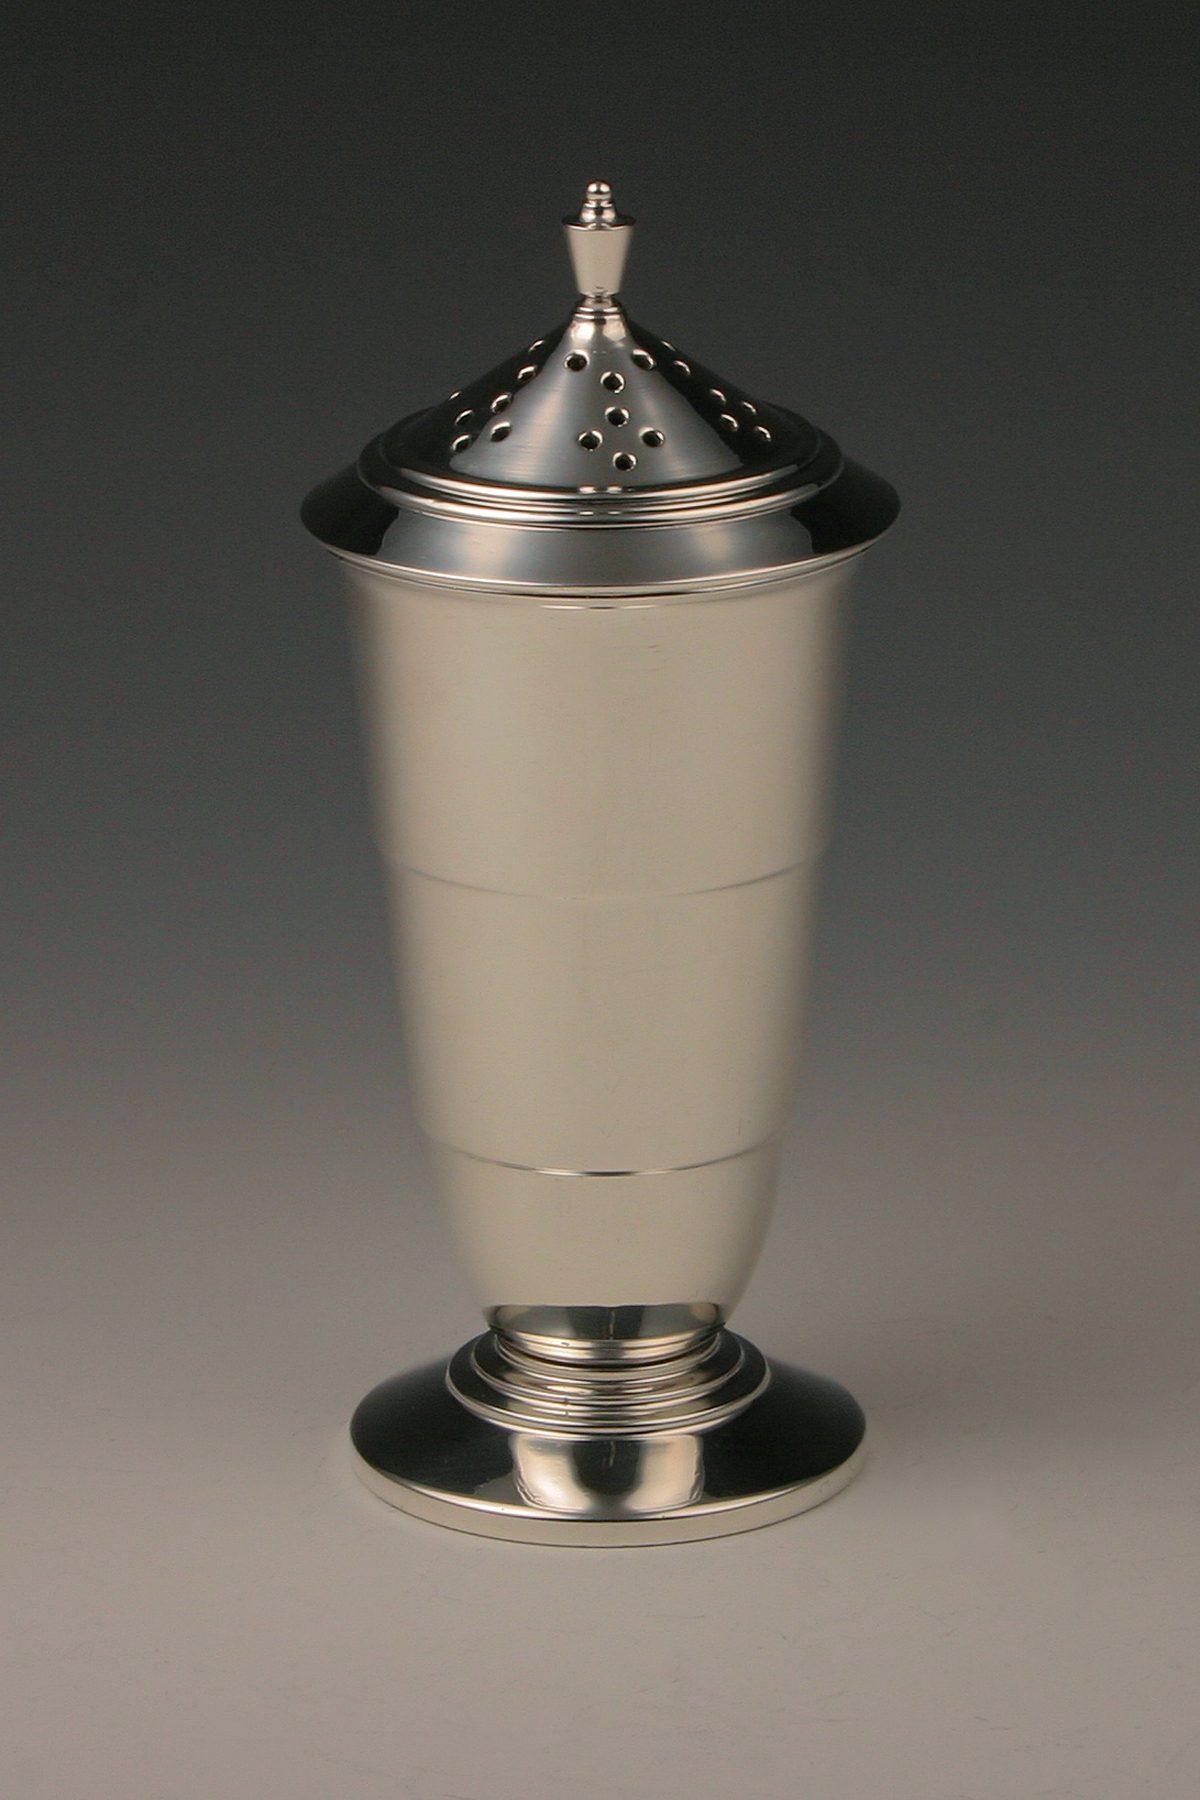 Art_Deco_Zuckerstreuer_Sterling_Silber_Birmingham_1937_Gloster_Ltd_T